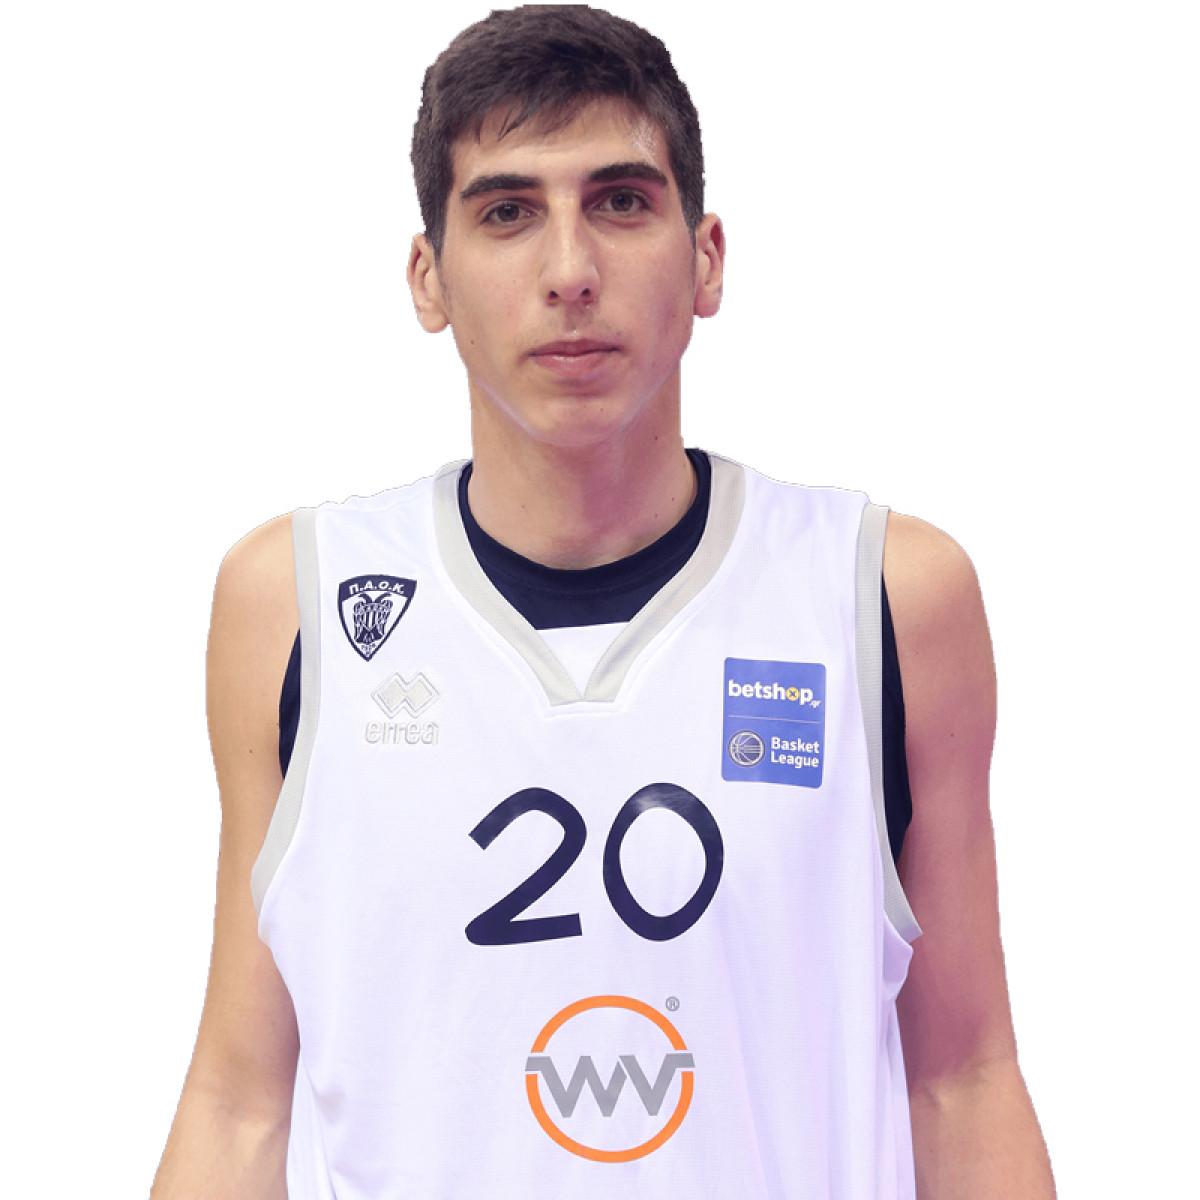 Photo of Konstantinos Iatridis, 2018-2019 season